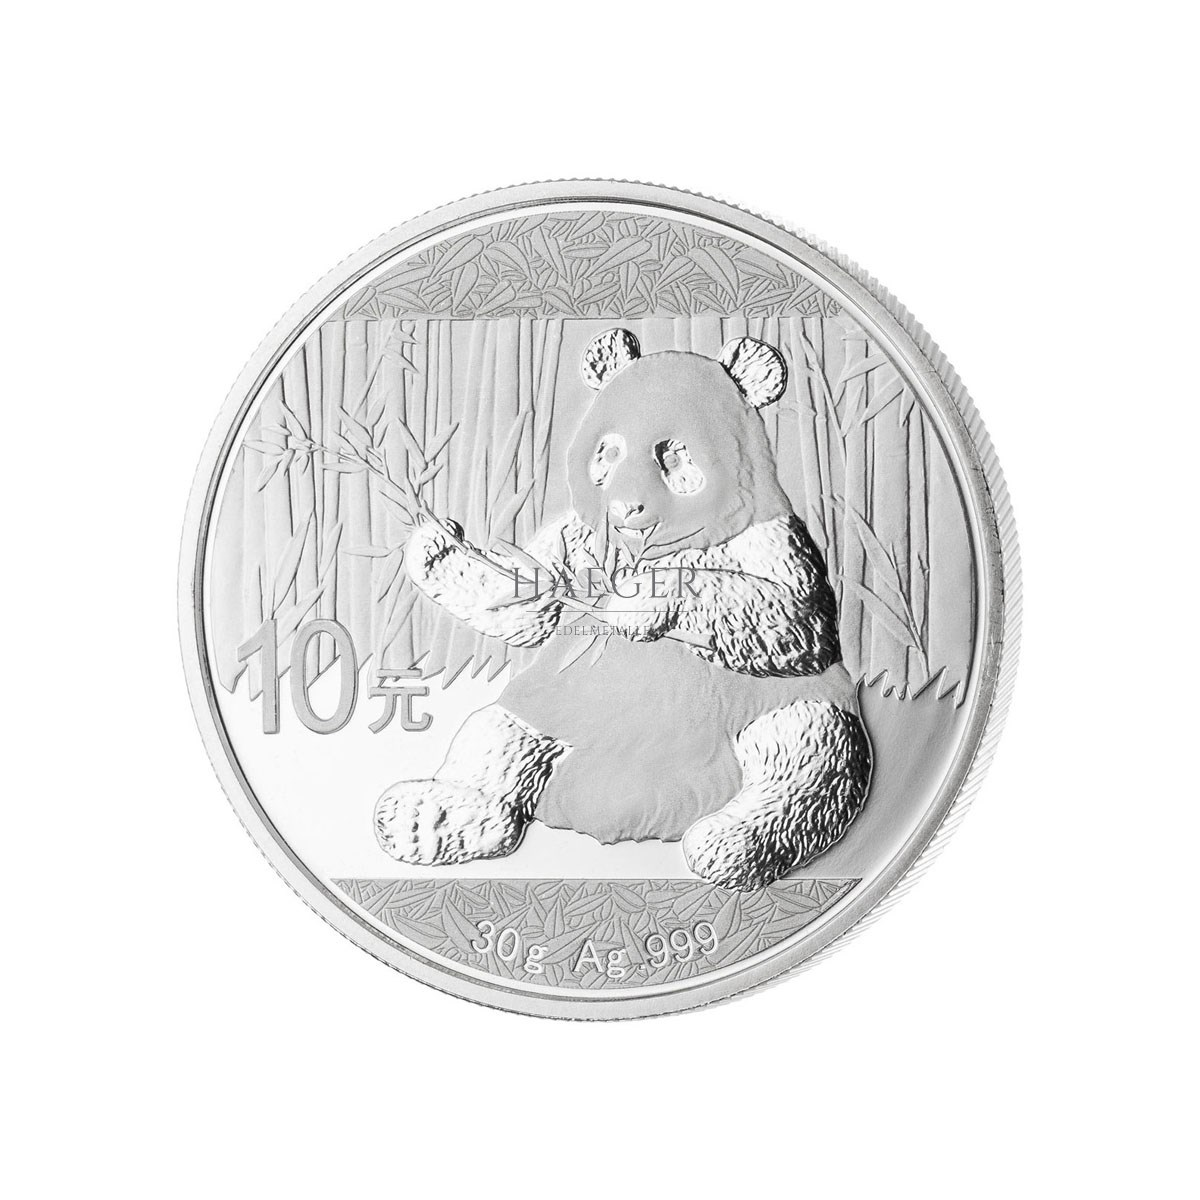 30 g China Panda Silbermünze Neuware Jahrgang 2021